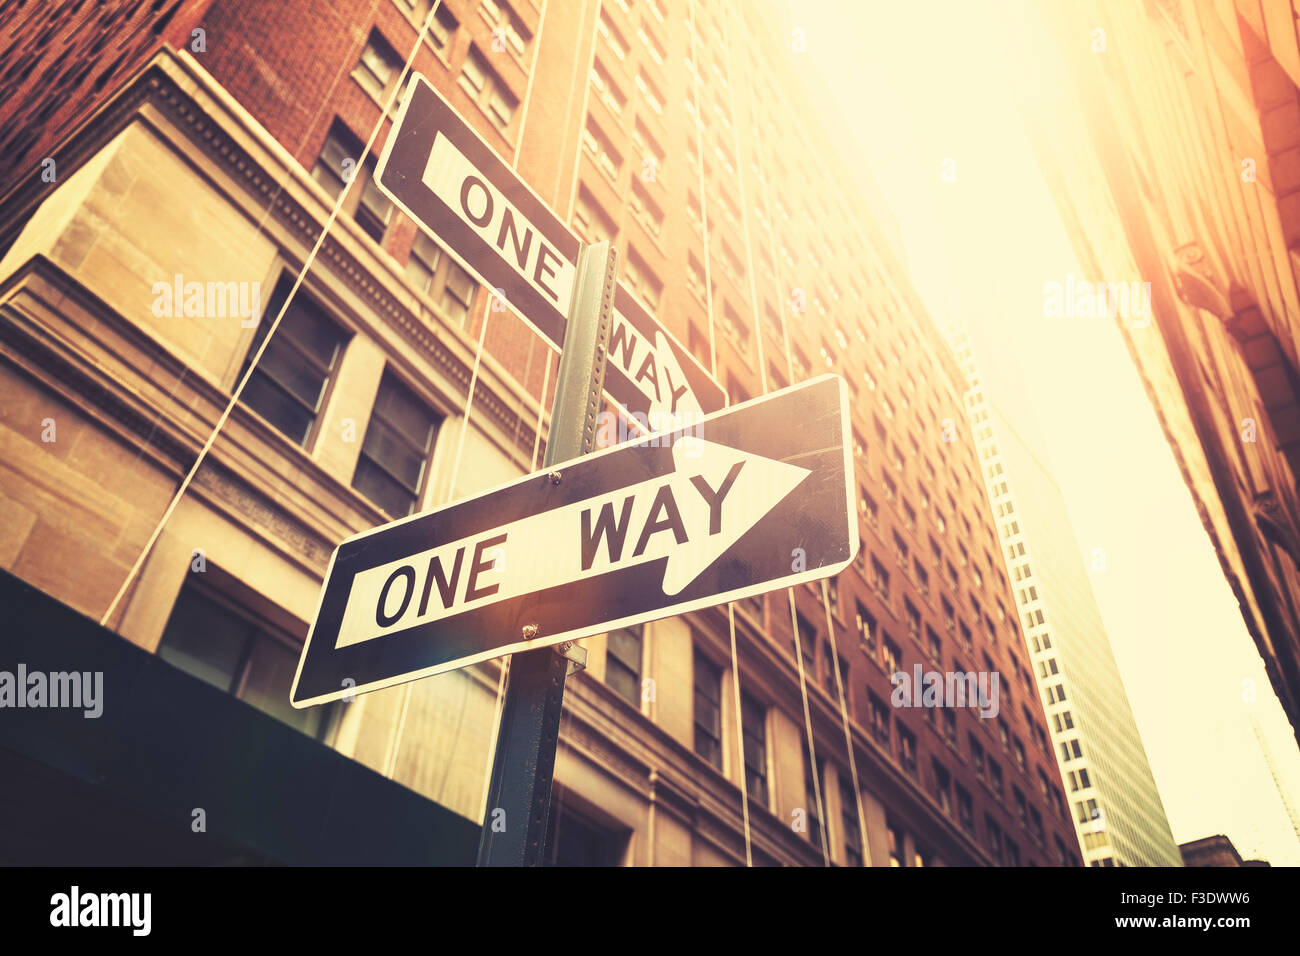 Retro style 'one way' signes sur la rue de Manhattan, profondeur de champ, New York, USA. Photo Stock